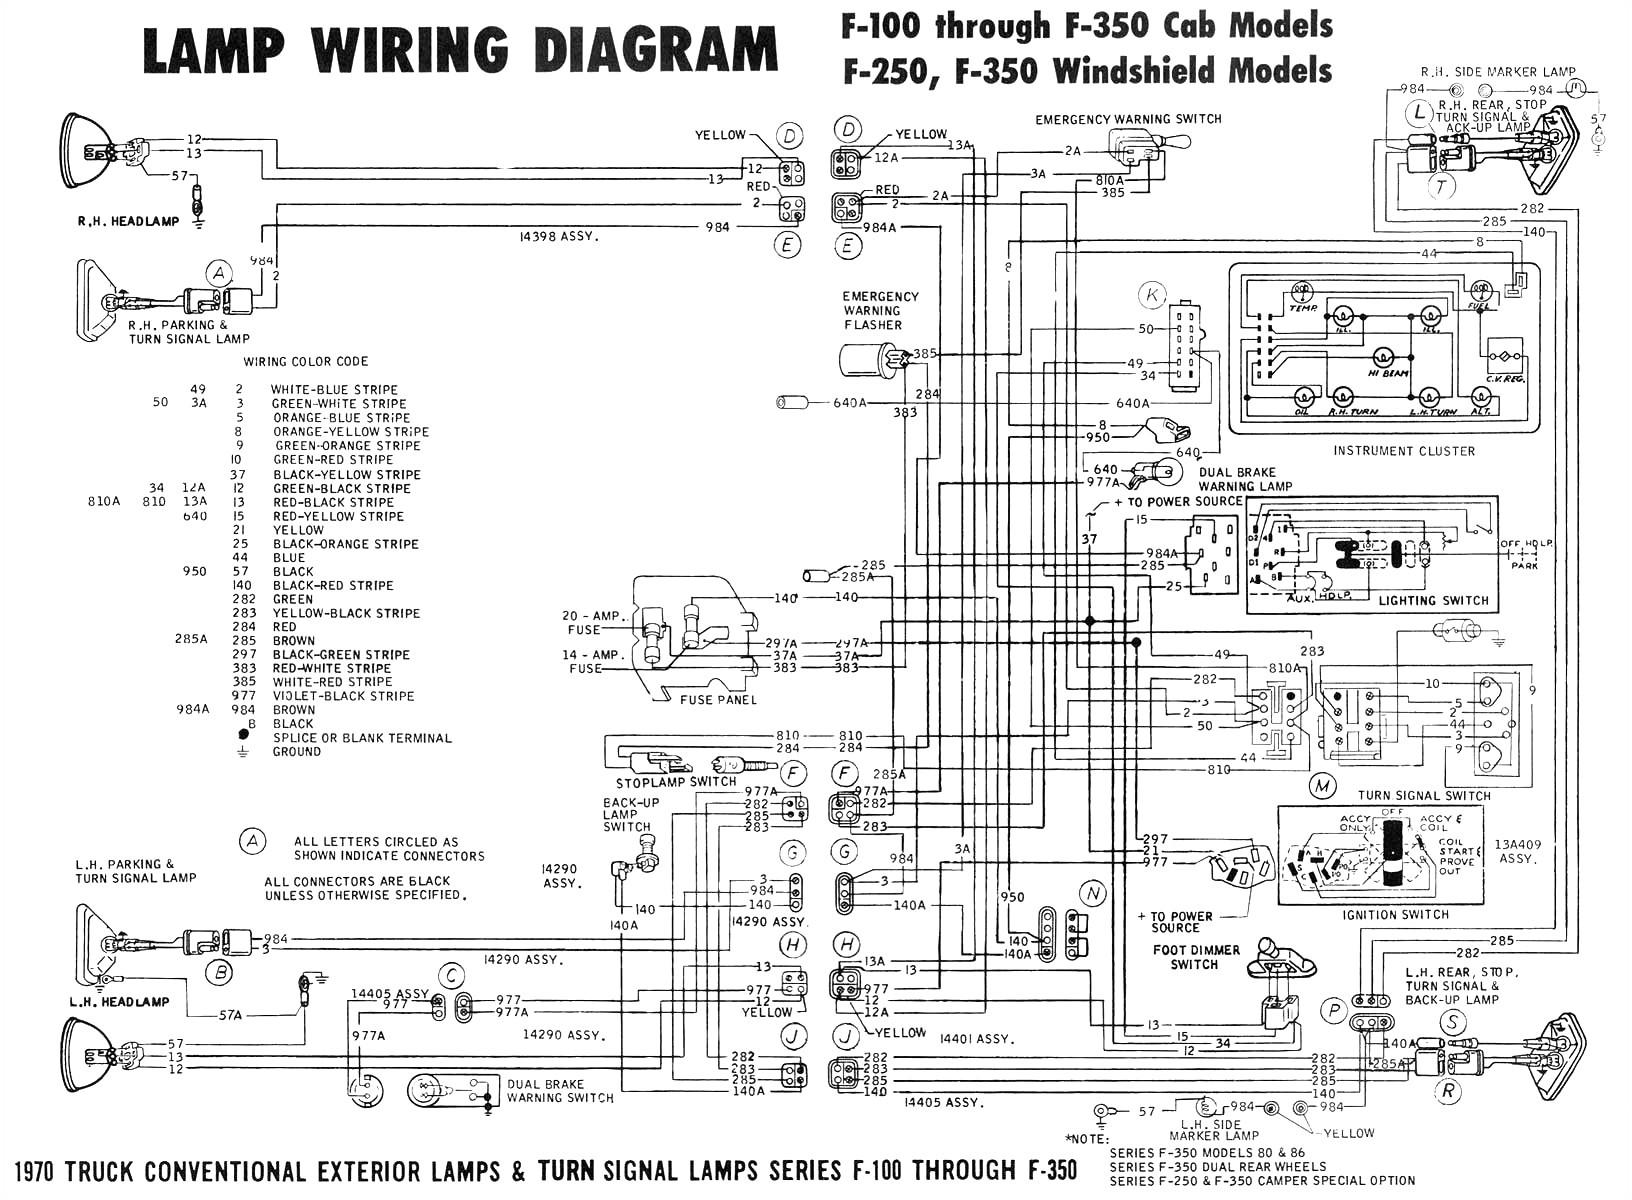 1994 ford E350 Wiring Diagram 1994 E350 Wiring Diagram Data Schematic Diagram